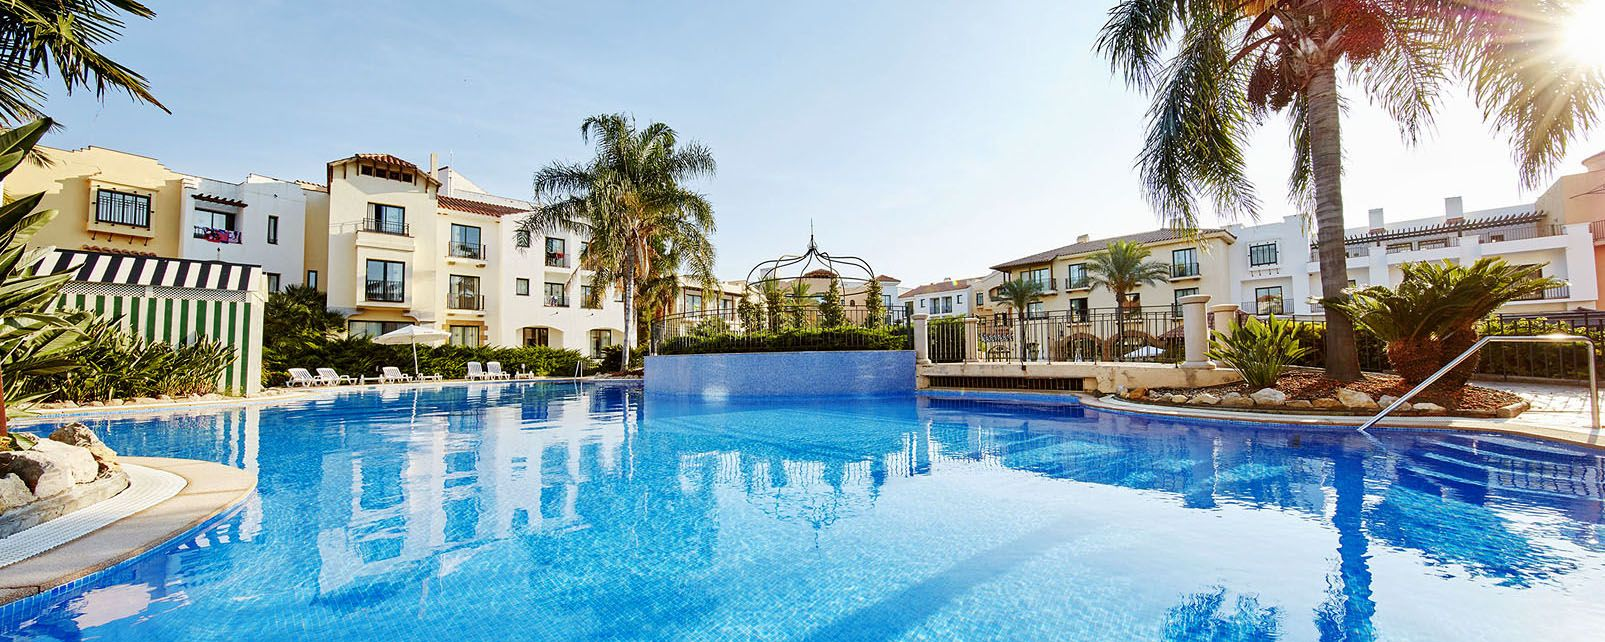 Hotel  PortAventura hotel